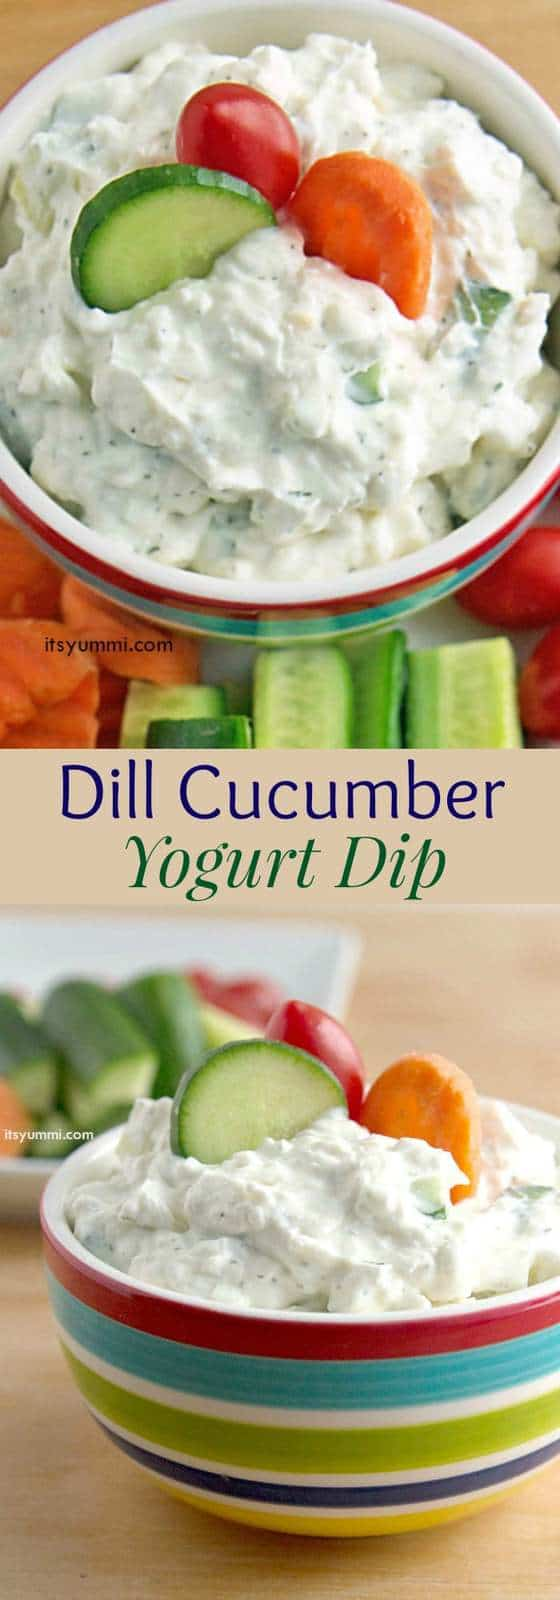 Creamy Dill Cucumber Yogurt Dip - Cupcakes & Kale Chips